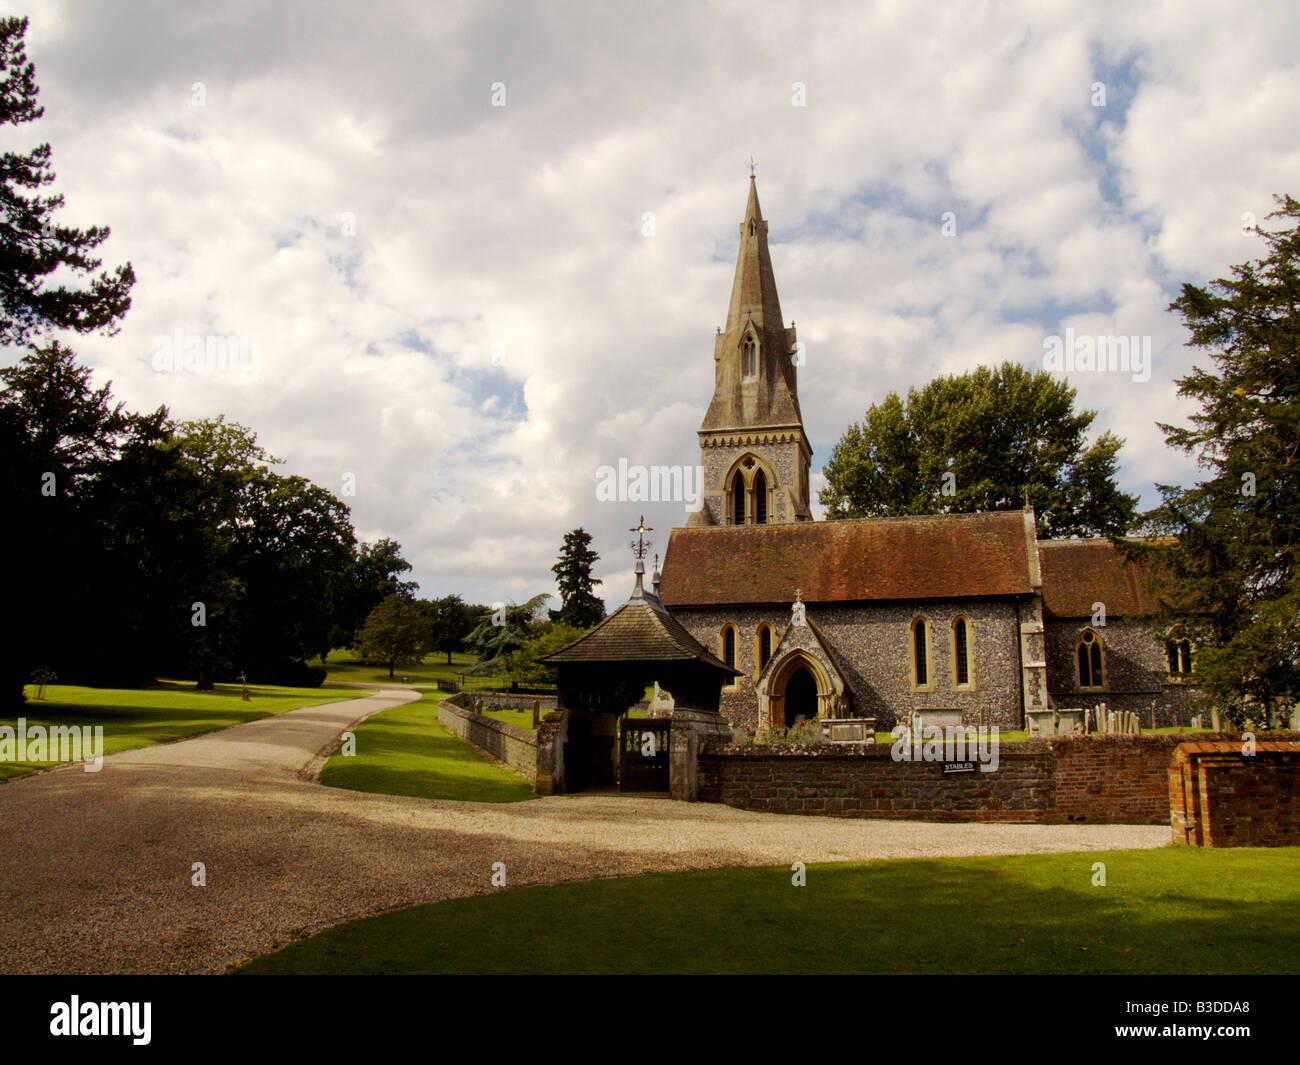 Saint mark s church englefield berkshire stock photo St mark s church englefield